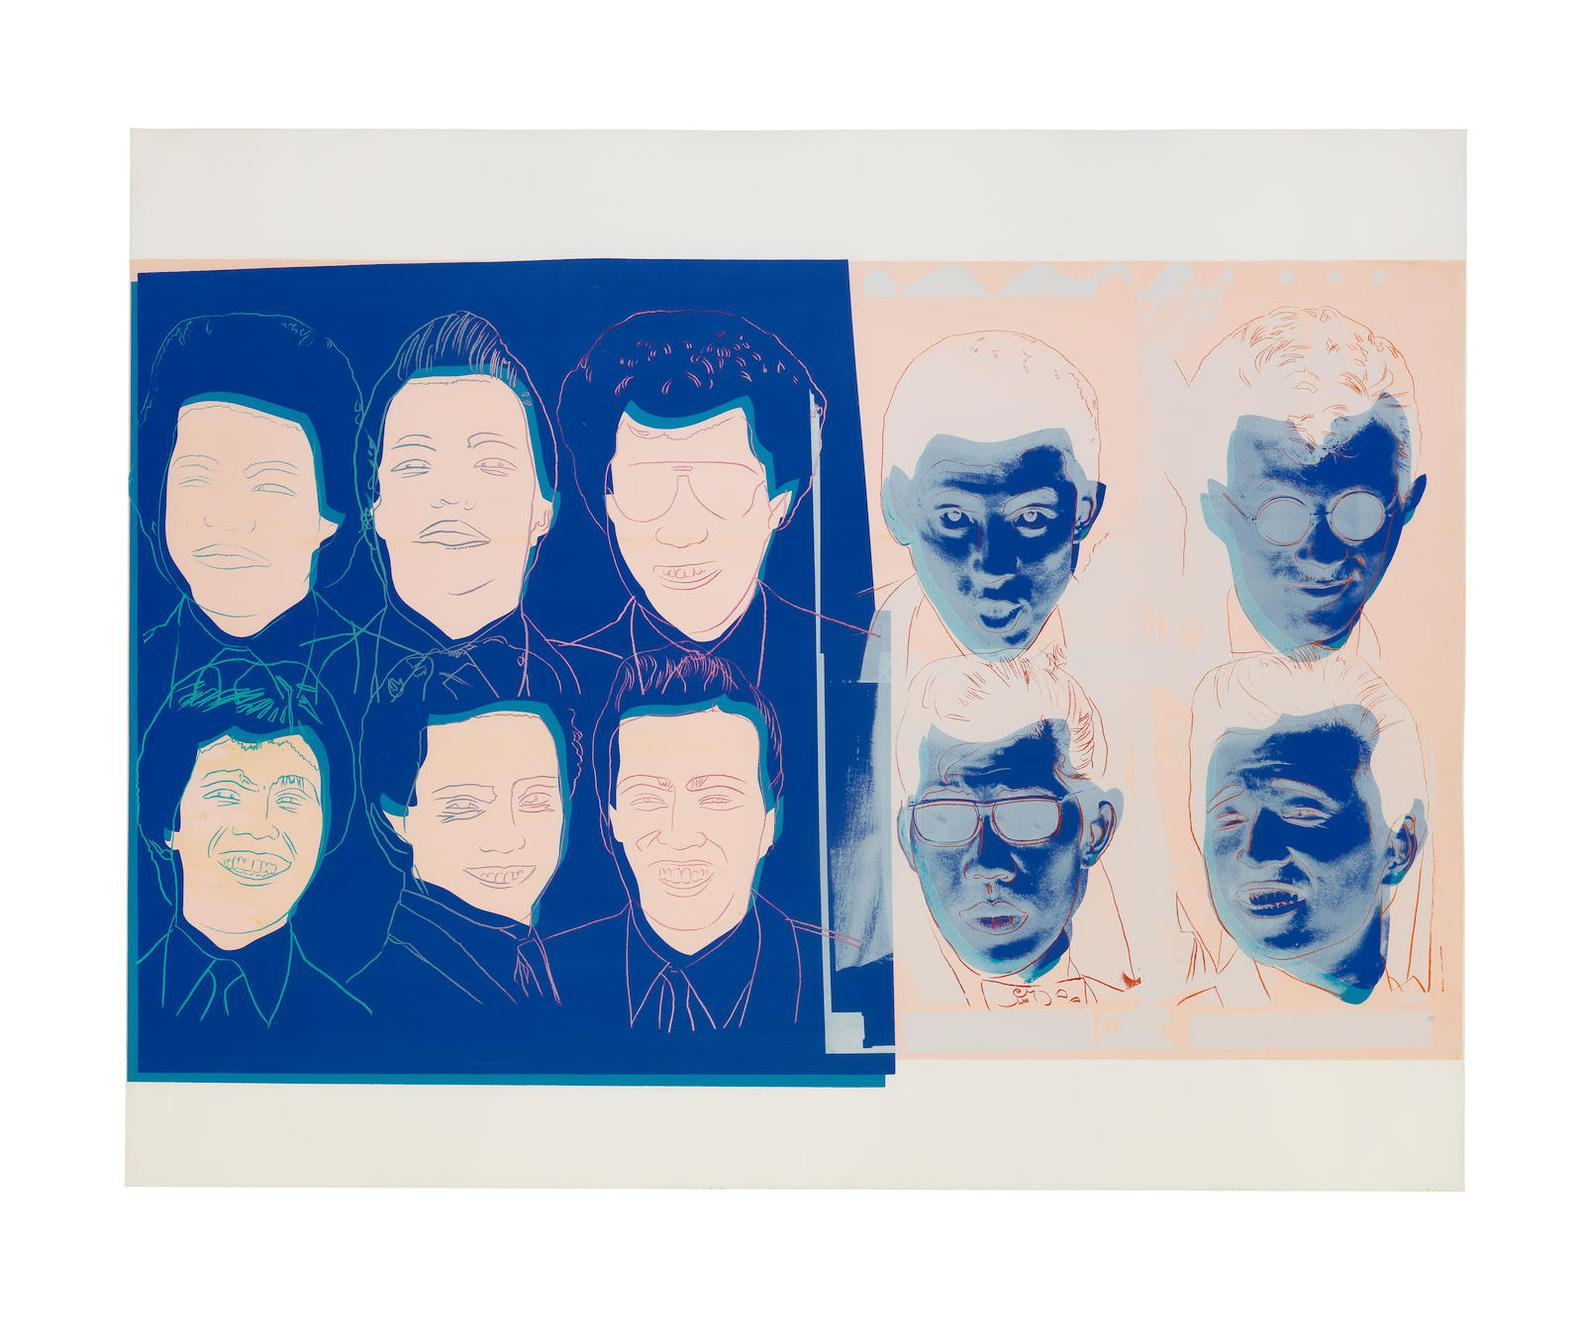 Andy Warhol-Rats & Star (Feldman & Schellmann IIIb.21)-1983